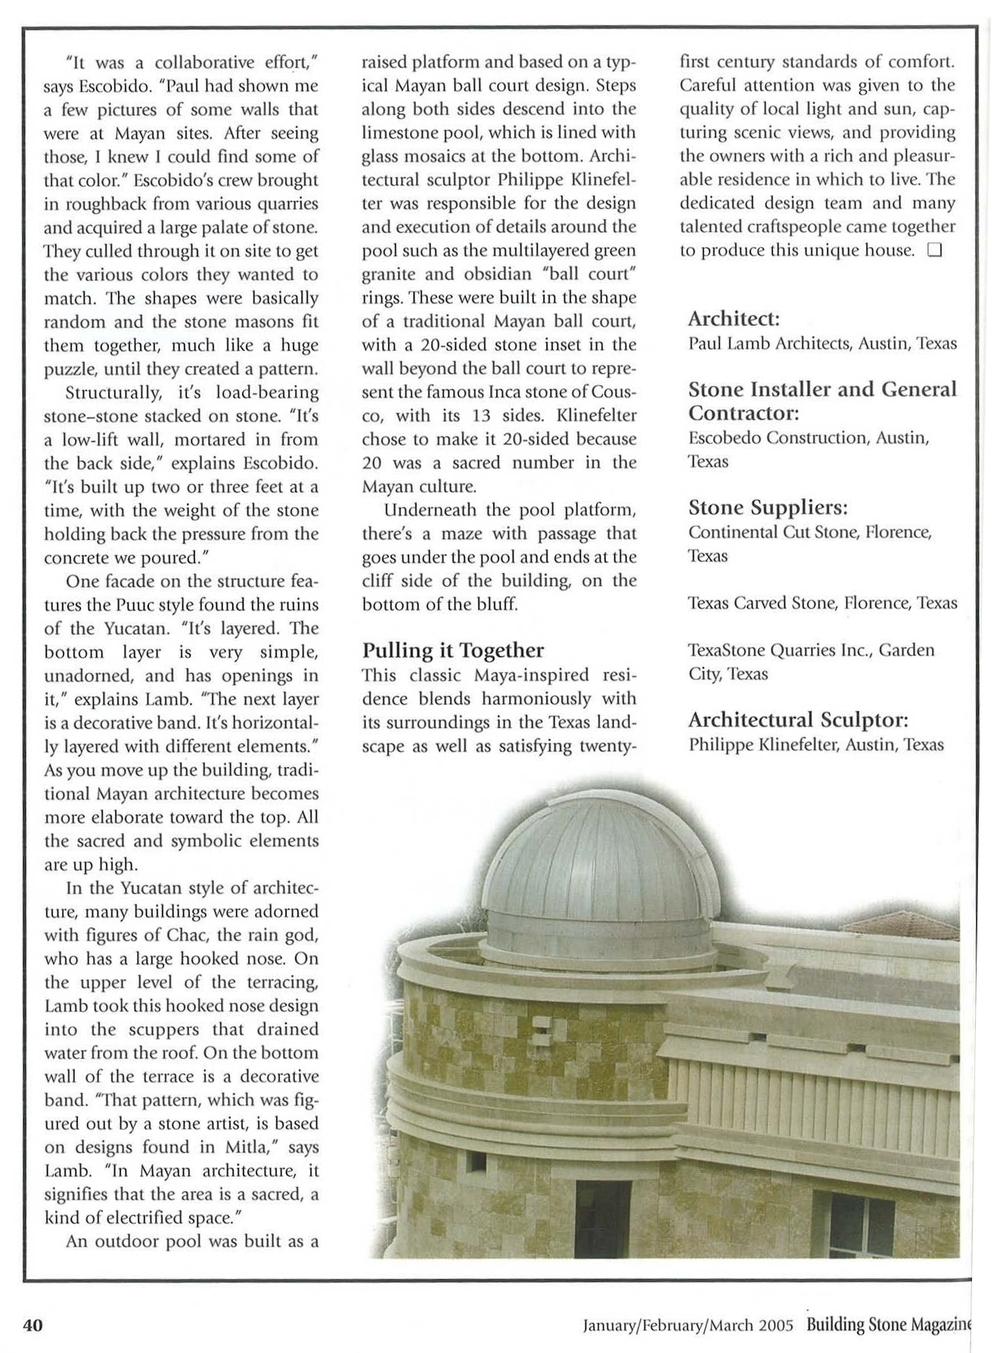 Building Stone Magazine_Page_9.jpg